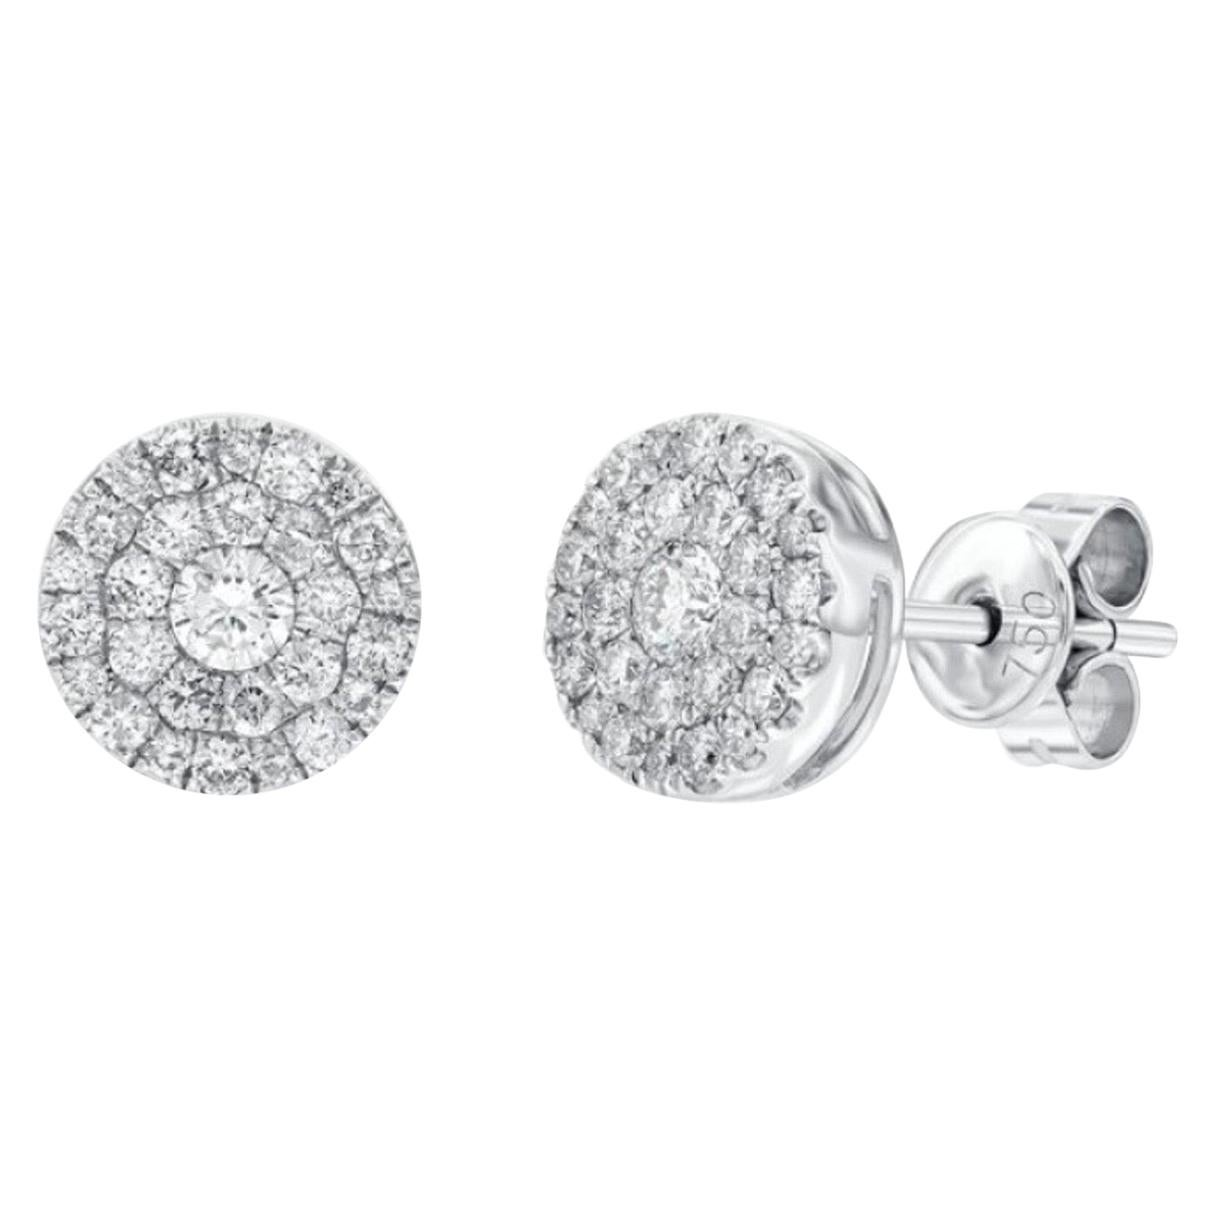 1.00 Carat Pave Set Cluster Round White Diamond 18 Karat Gold Stud Earrings